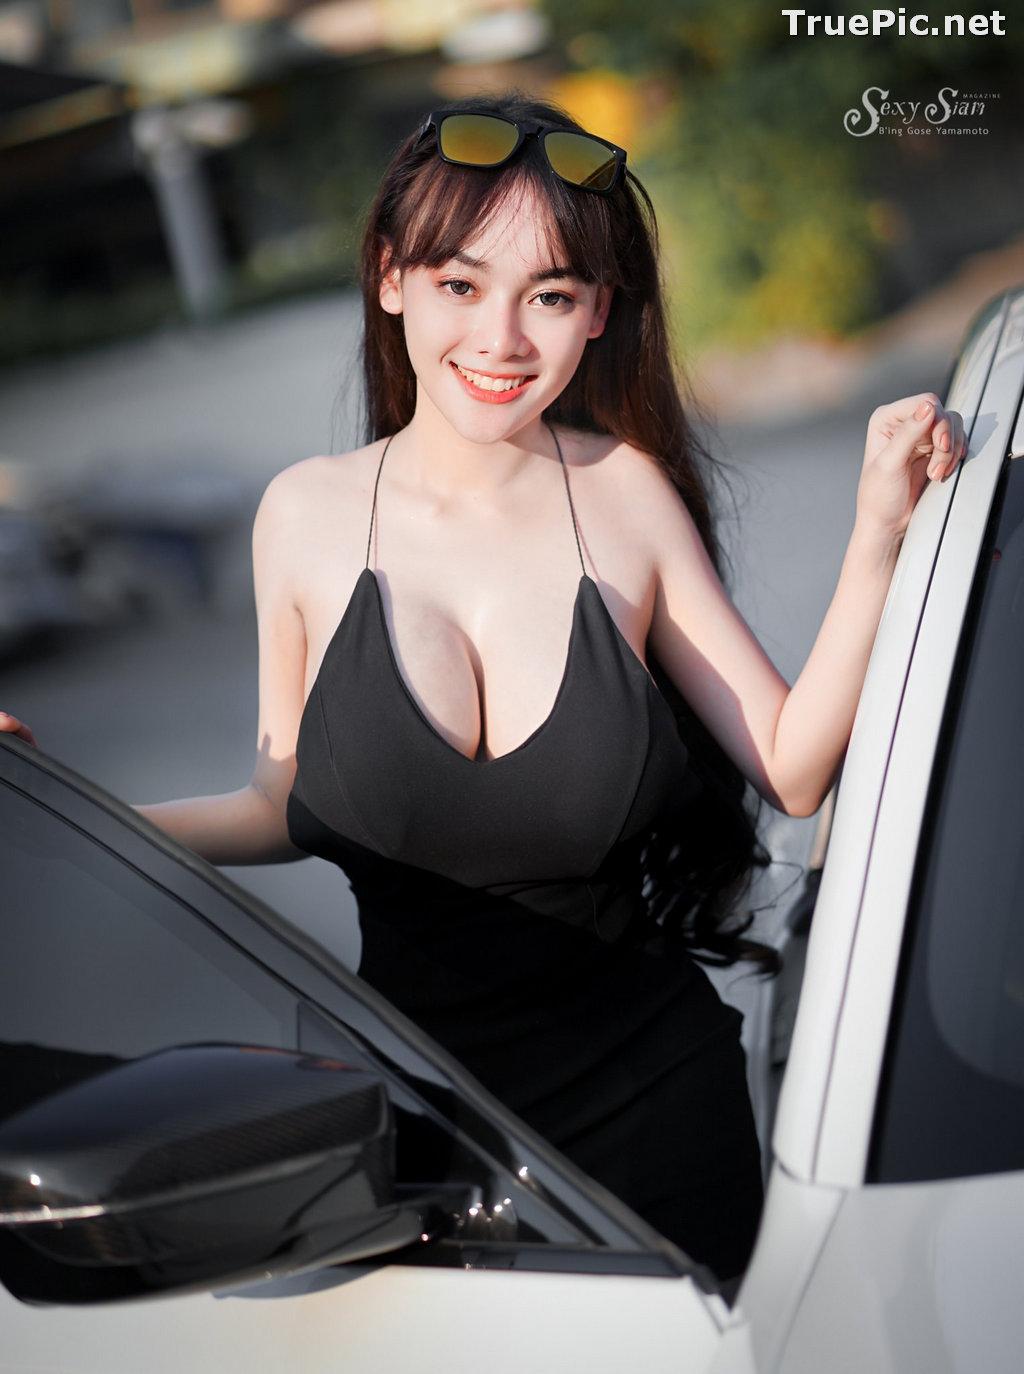 Image Thailand Model - จุ๊ปเปอร์ จุ๊ป - Sexy Black Car Girl - TruePic.net - Picture-8